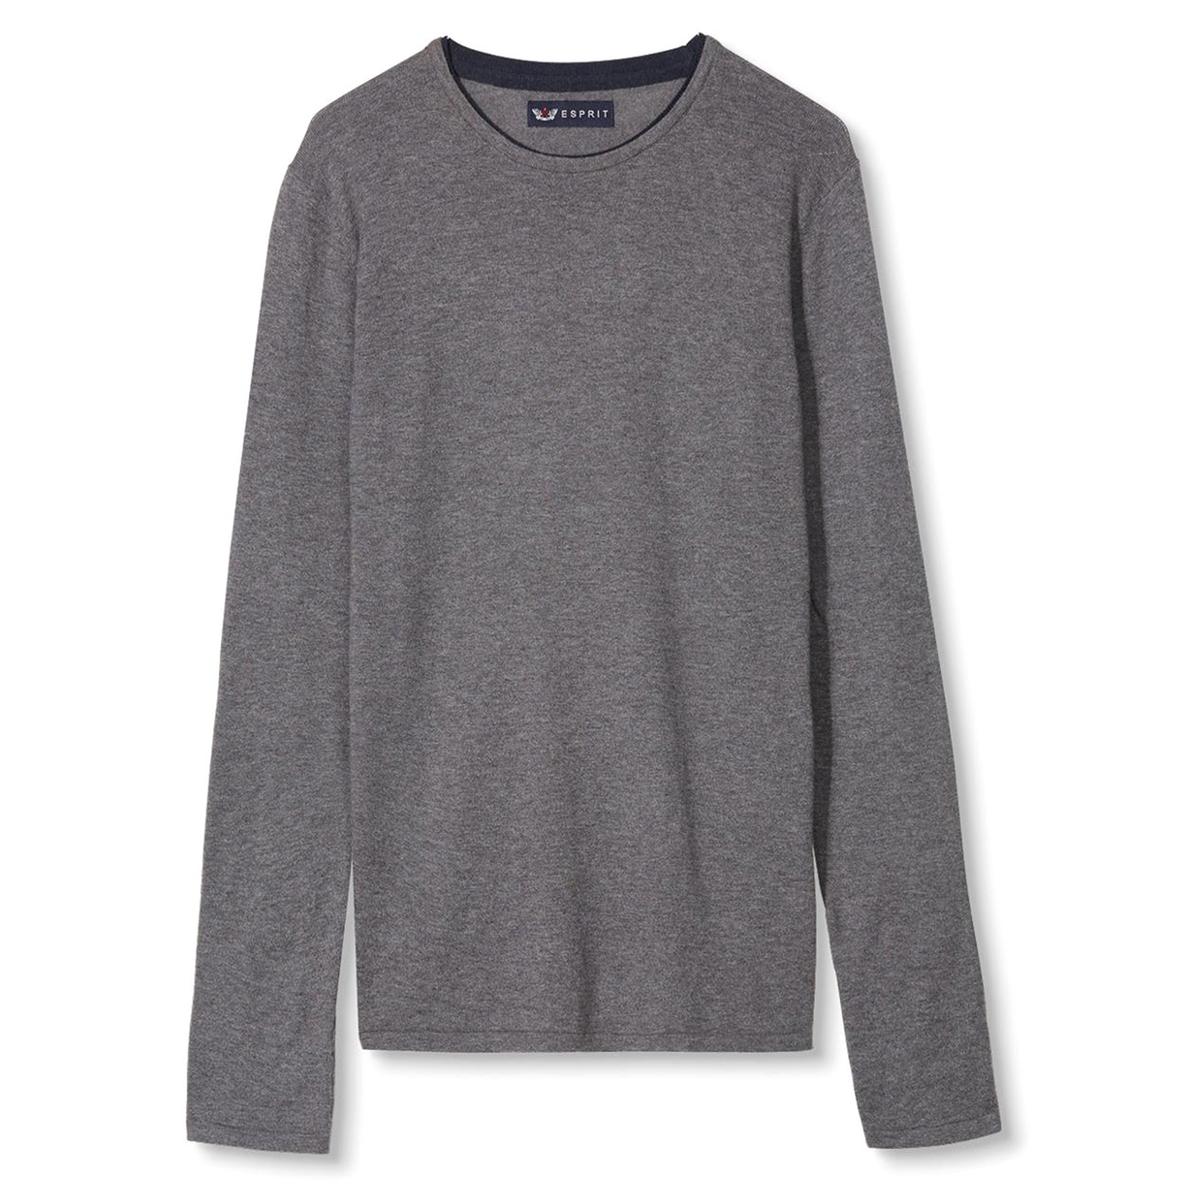 Пуловер с нашивками на локтях